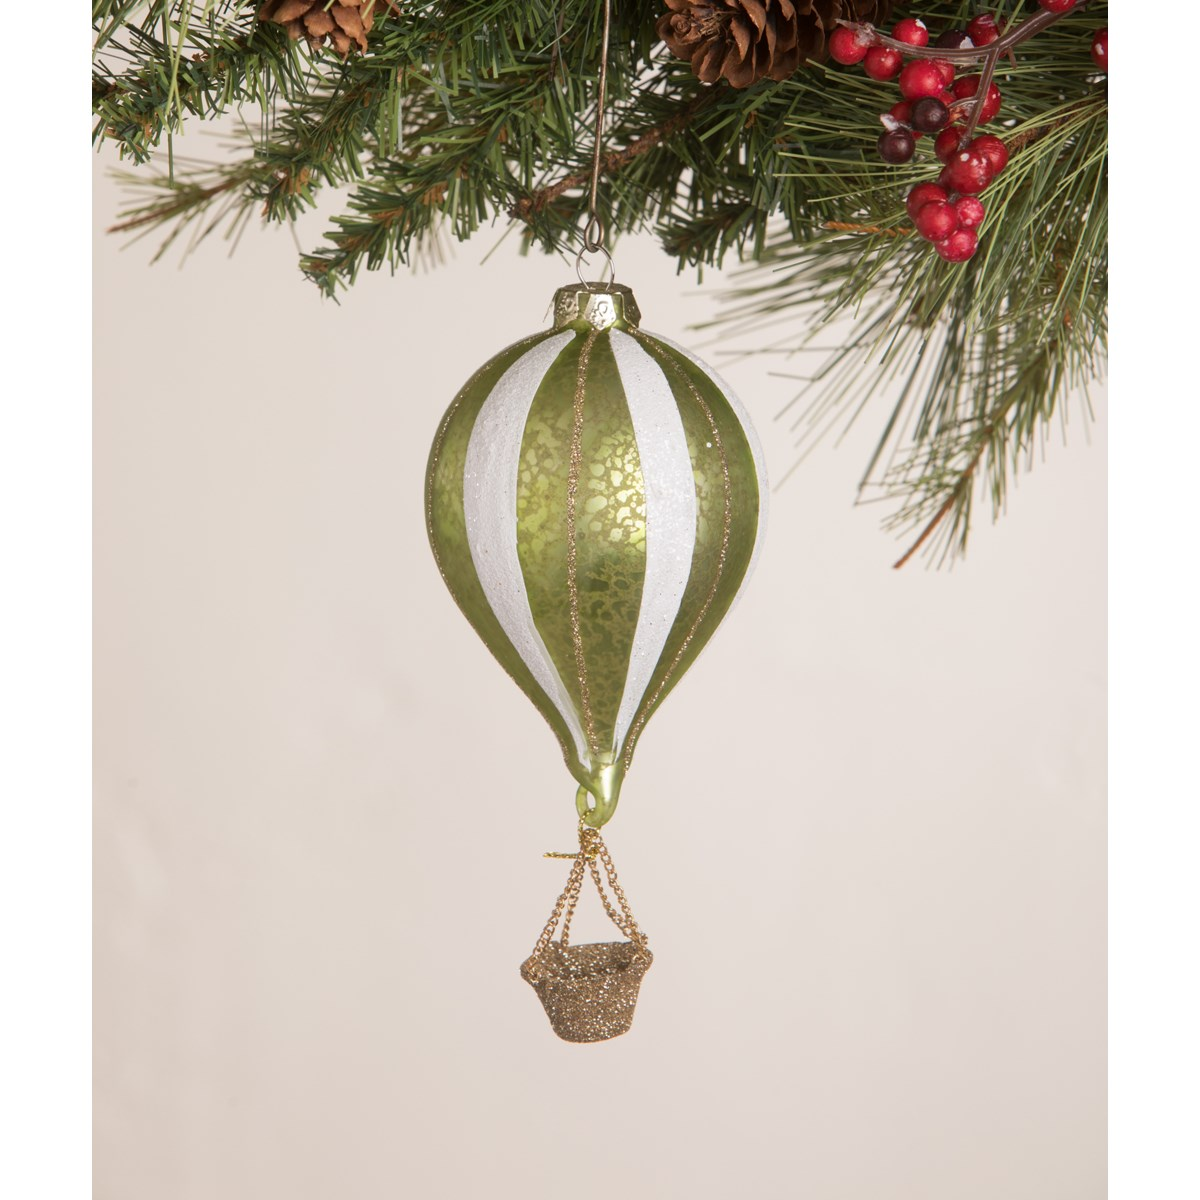 Citrene Striped Hot Air Balloon Ornament